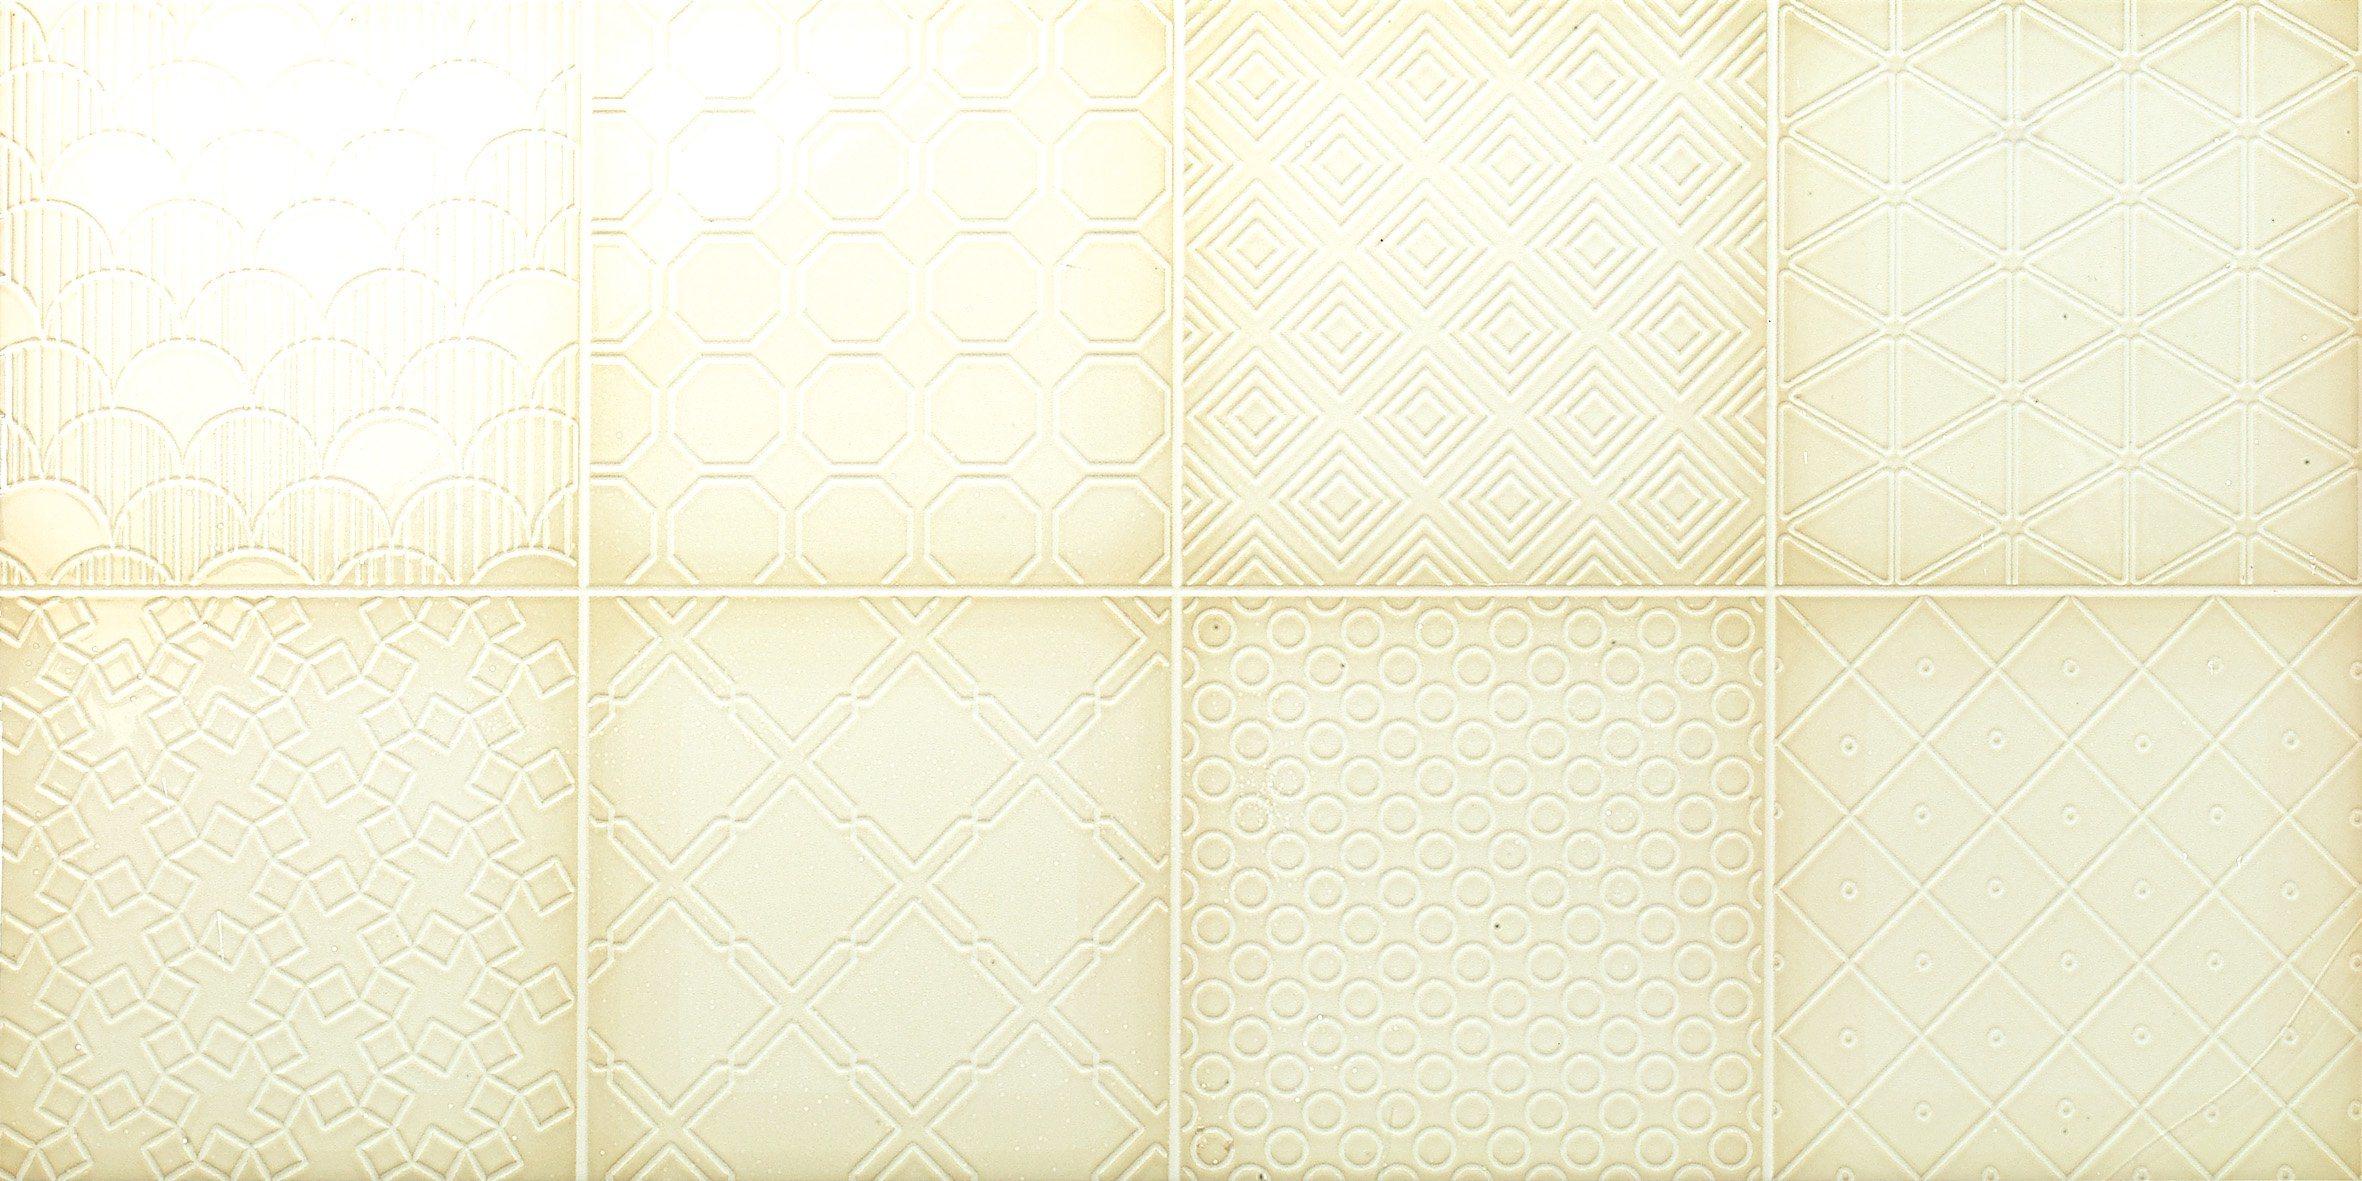 China Ceramic Tile New Design Parallelogram Wall Ceramic Tiles ...